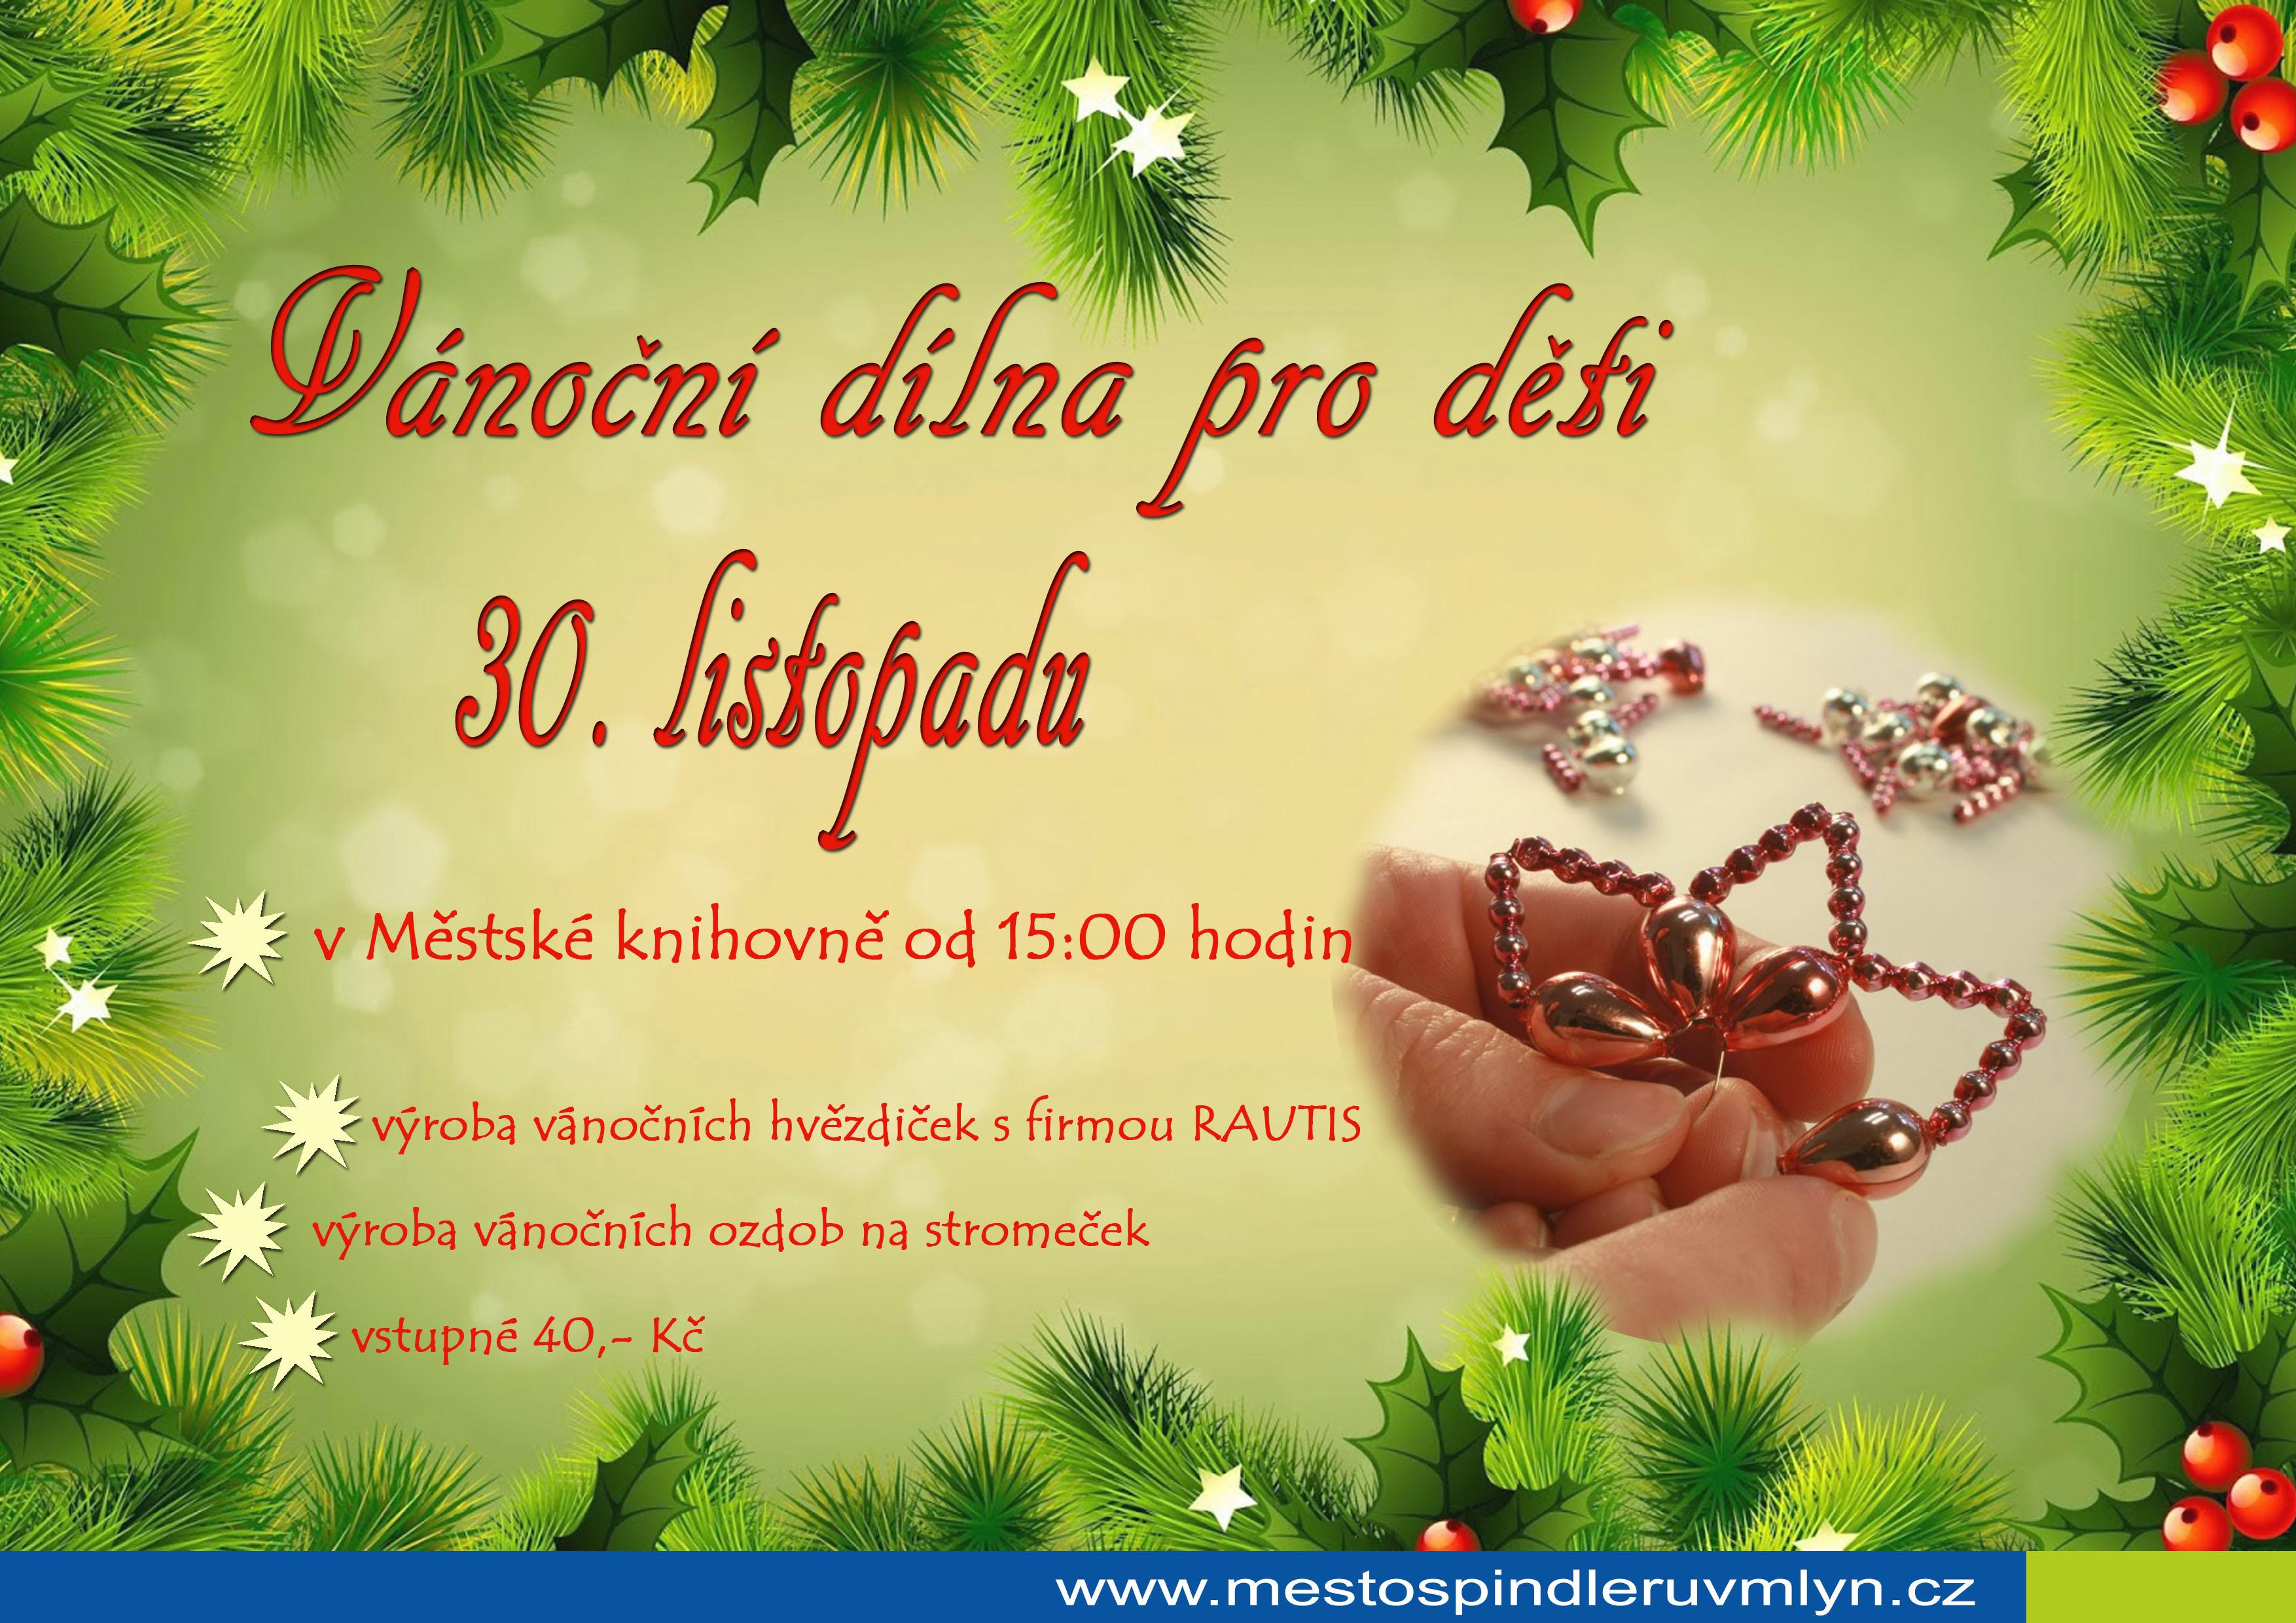 OBRÁZEK : vanocni_dilna_pro_deti.jpg